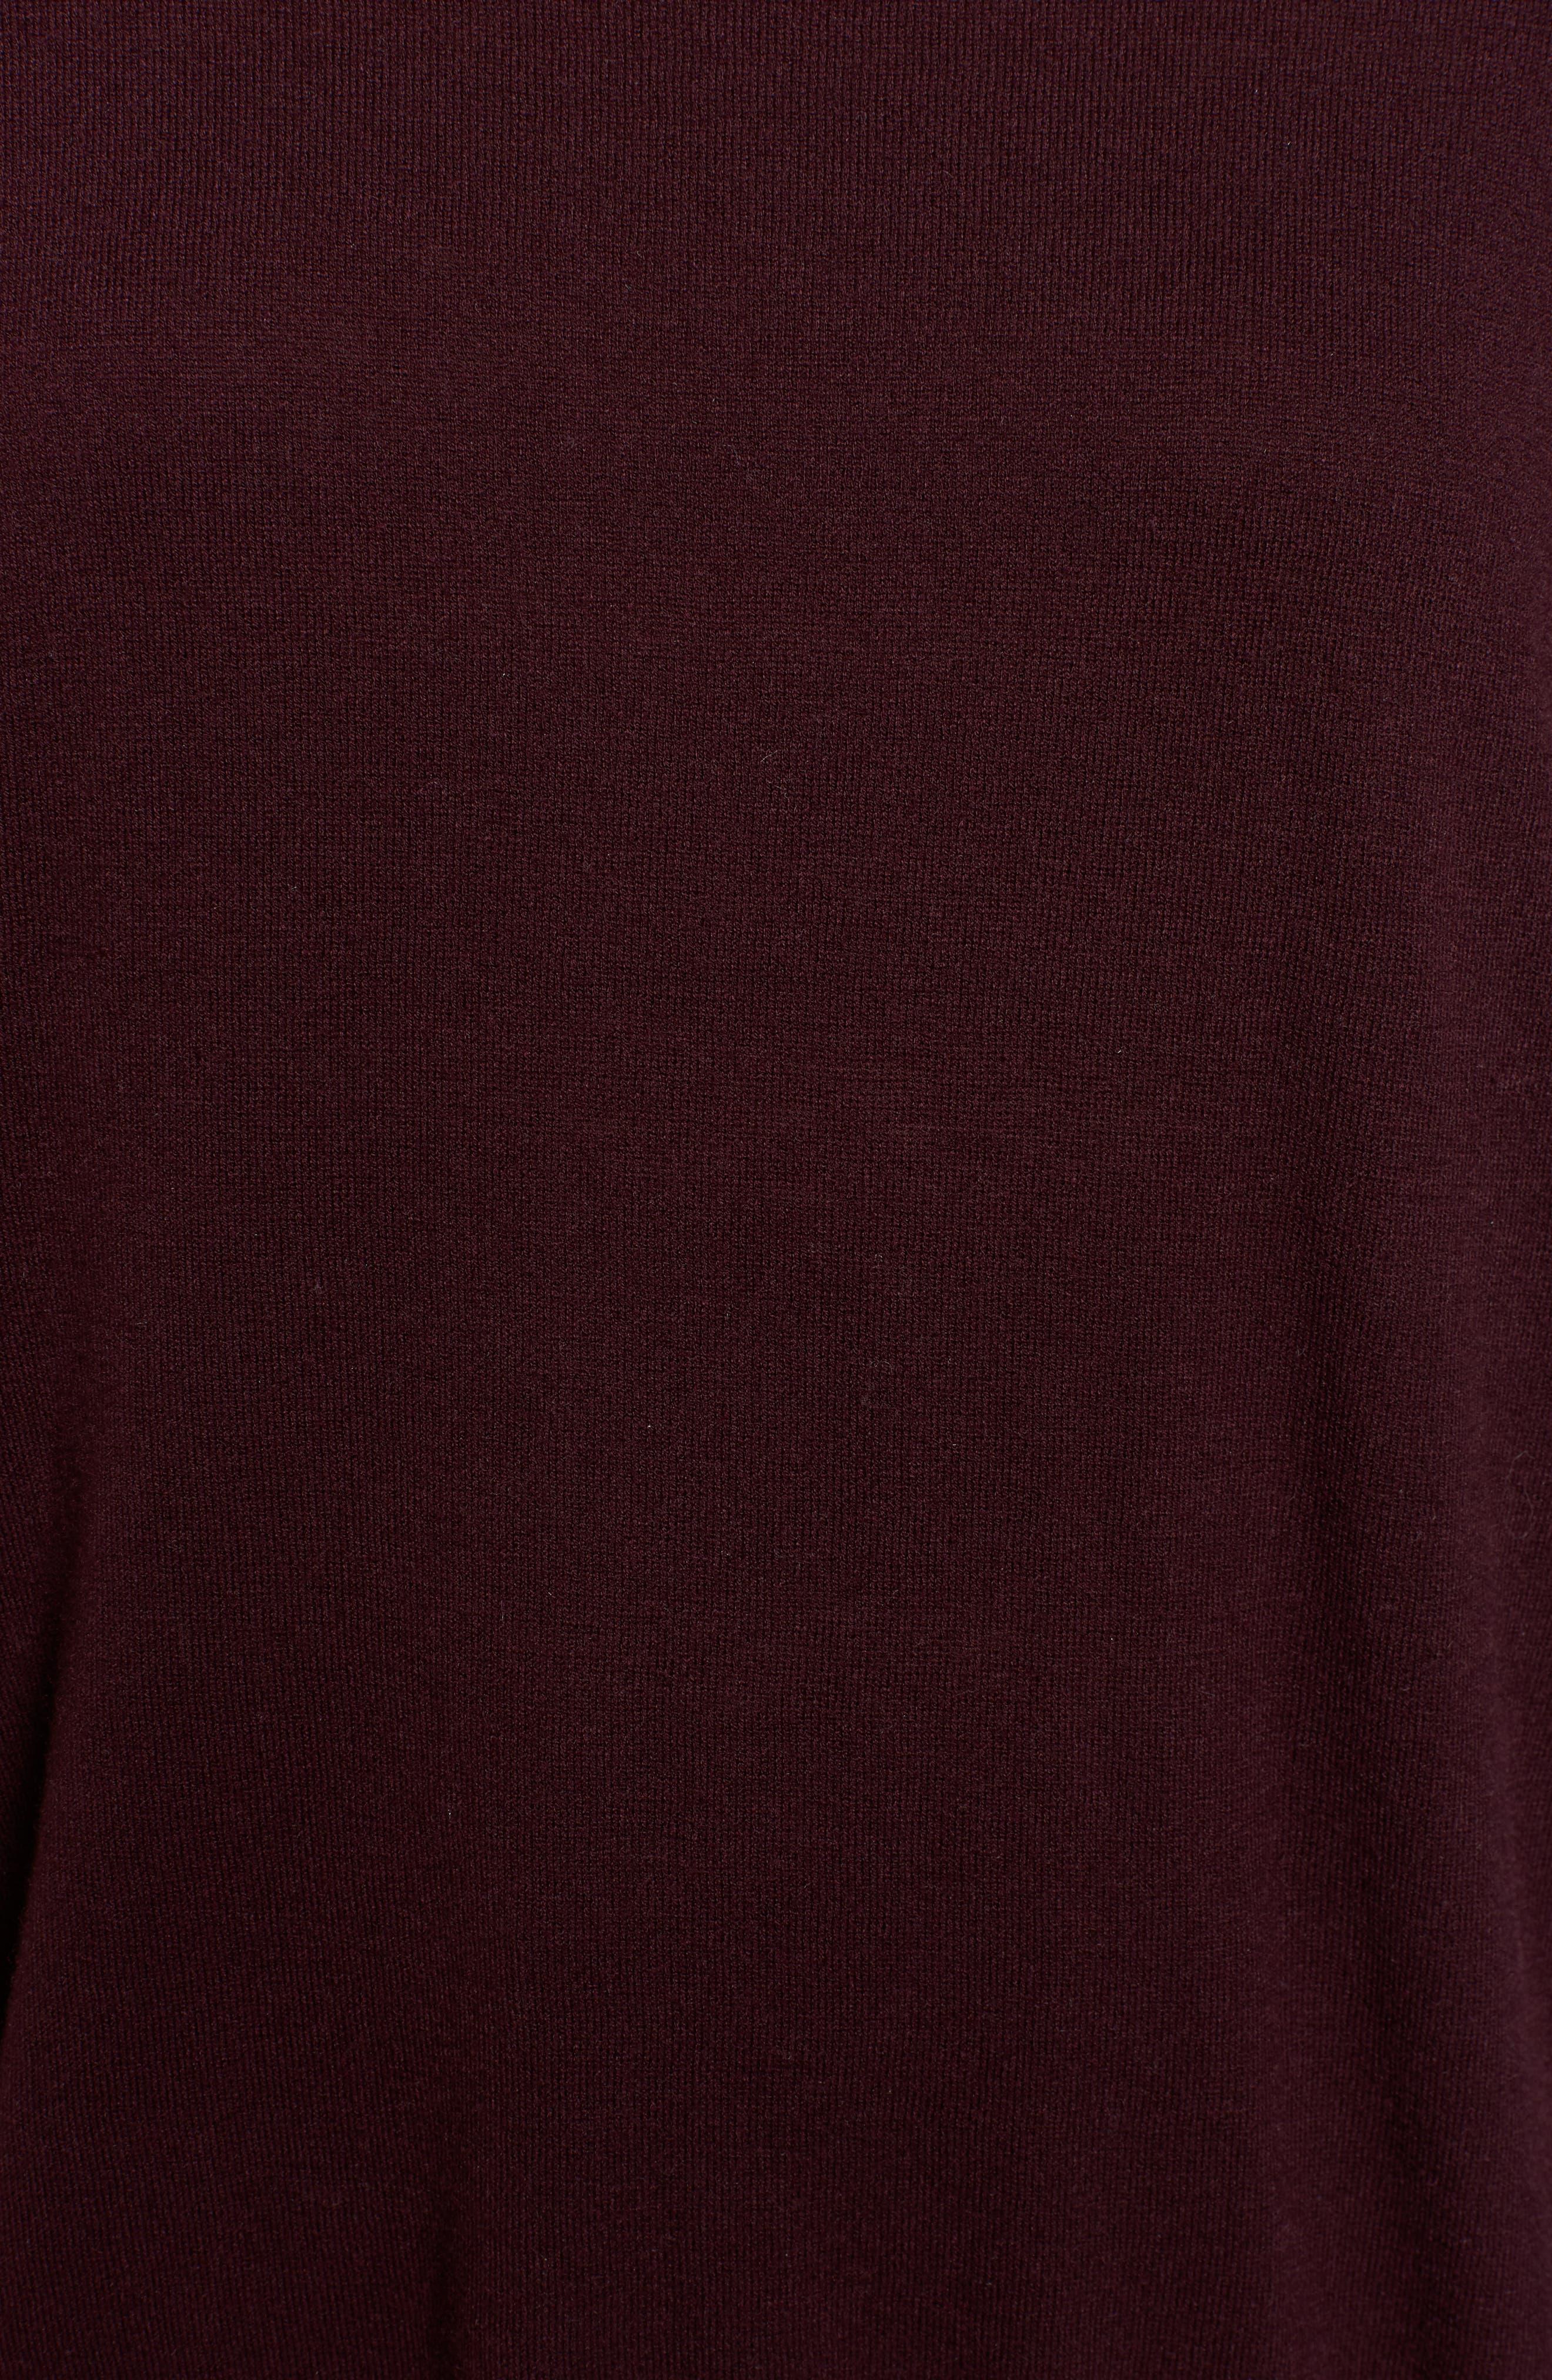 Canarise Cutout Sweater,                             Alternate thumbnail 10, color,